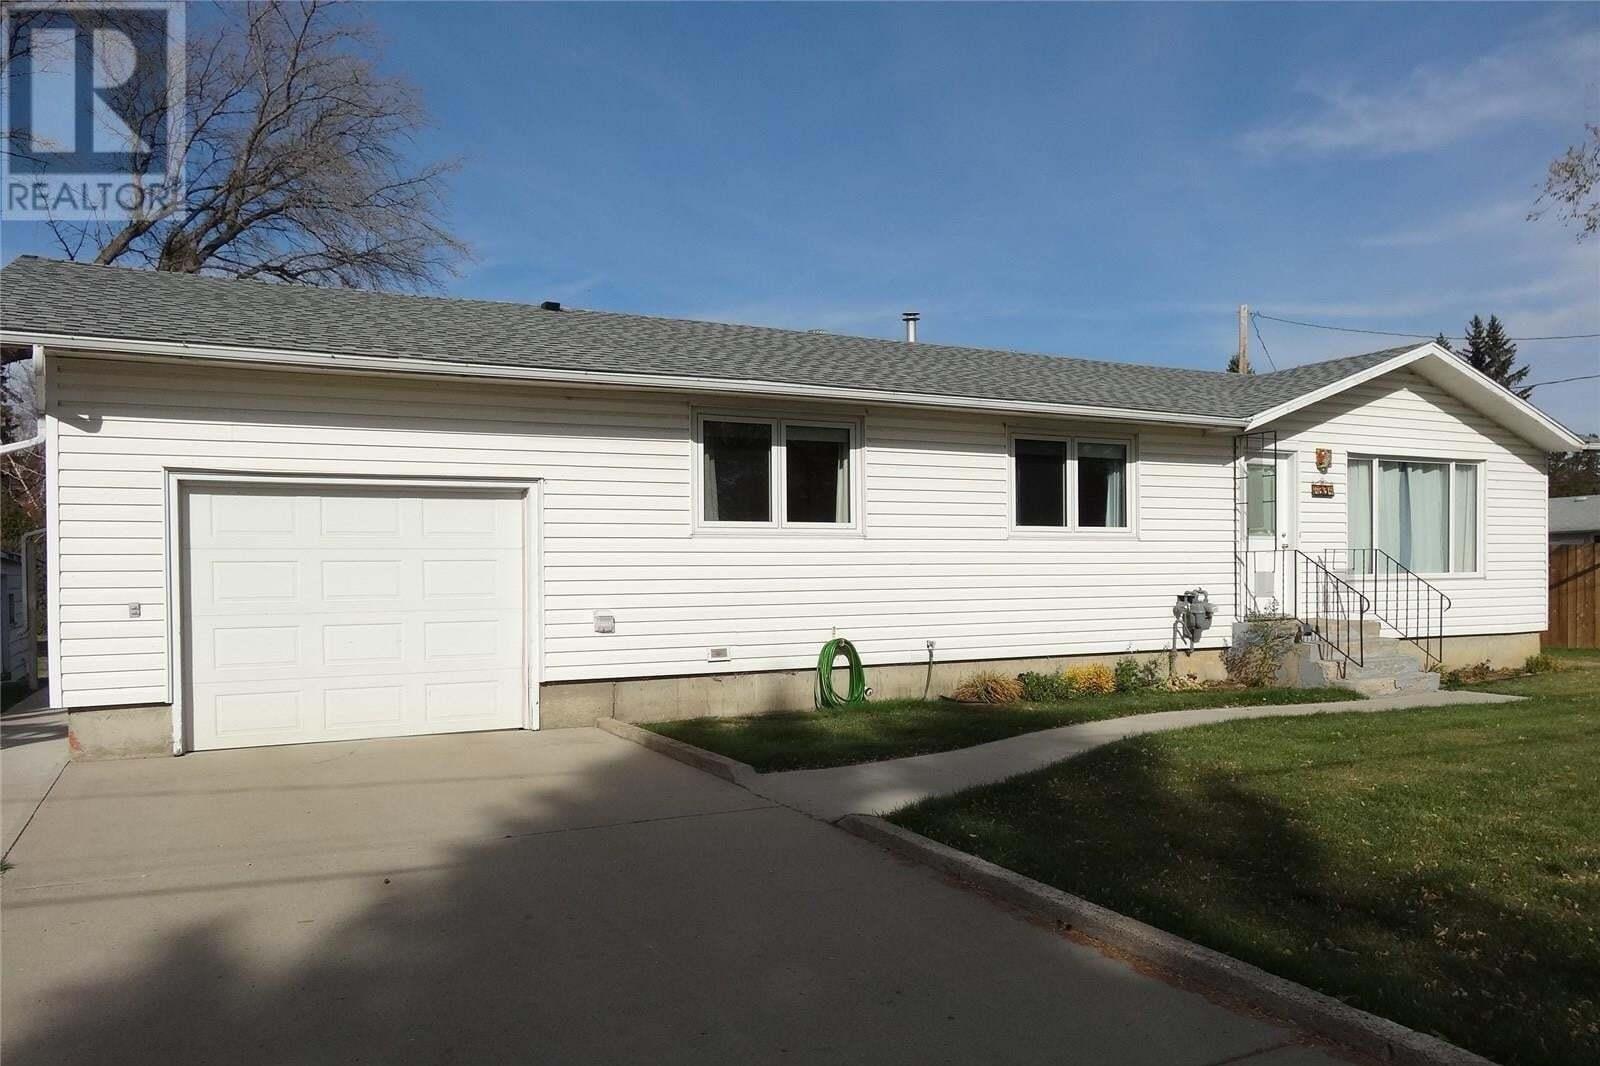 House for sale at 6004 7th St Rosthern Saskatchewan - MLS: SK830141